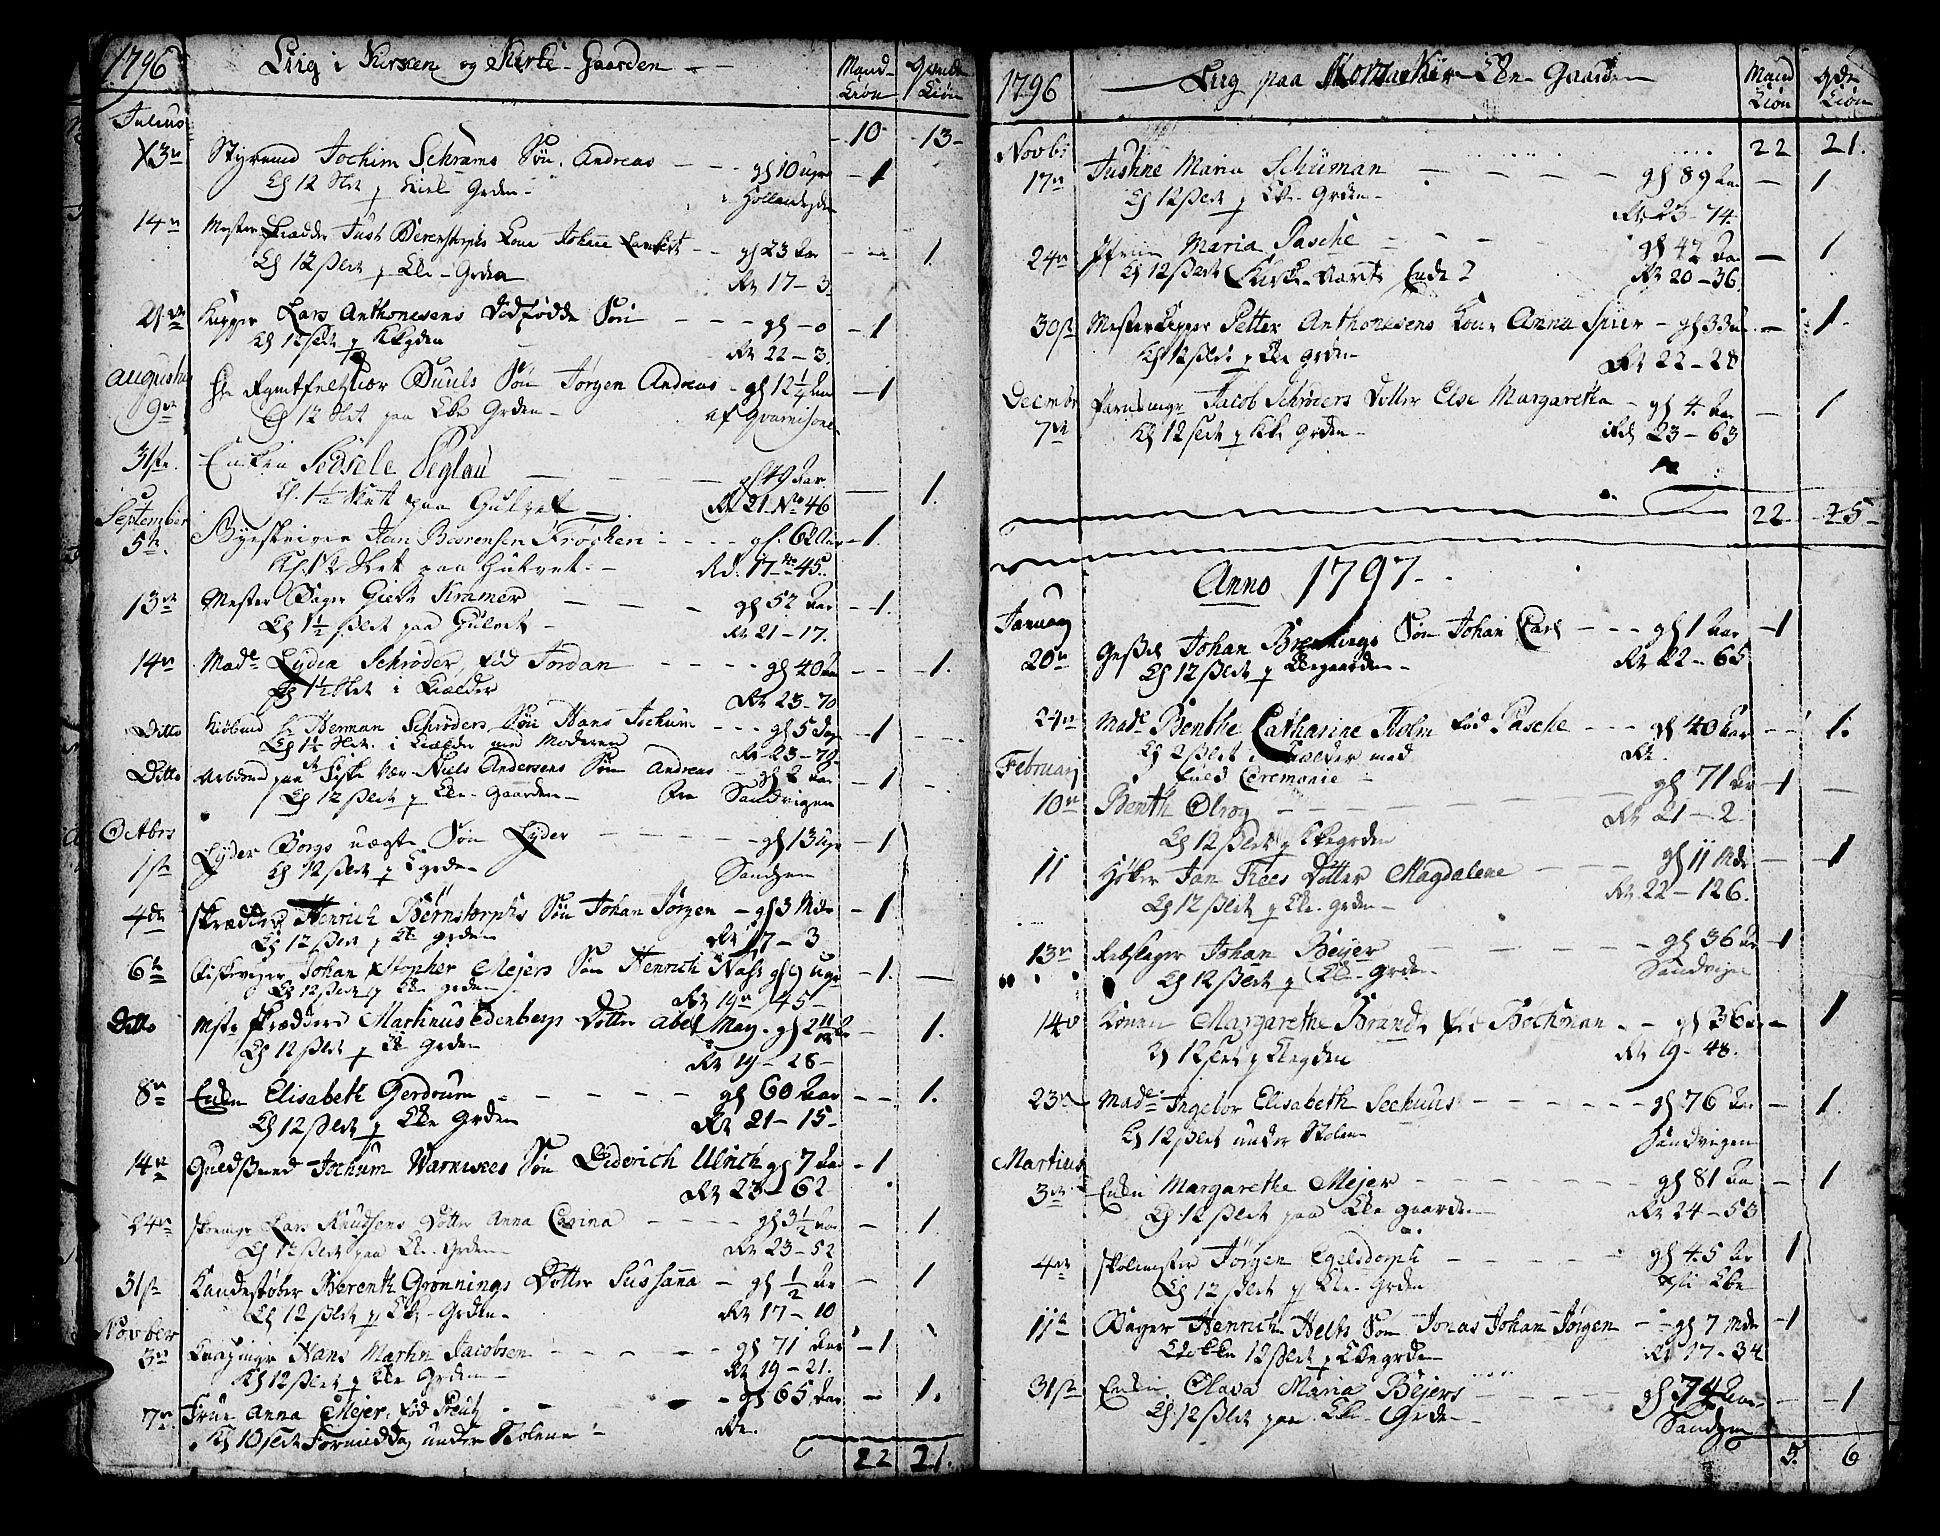 SAB, Korskirken Sokneprestembete, H/Haa/L0012: Ministerialbok nr. A 12, 1786-1832, s. 162